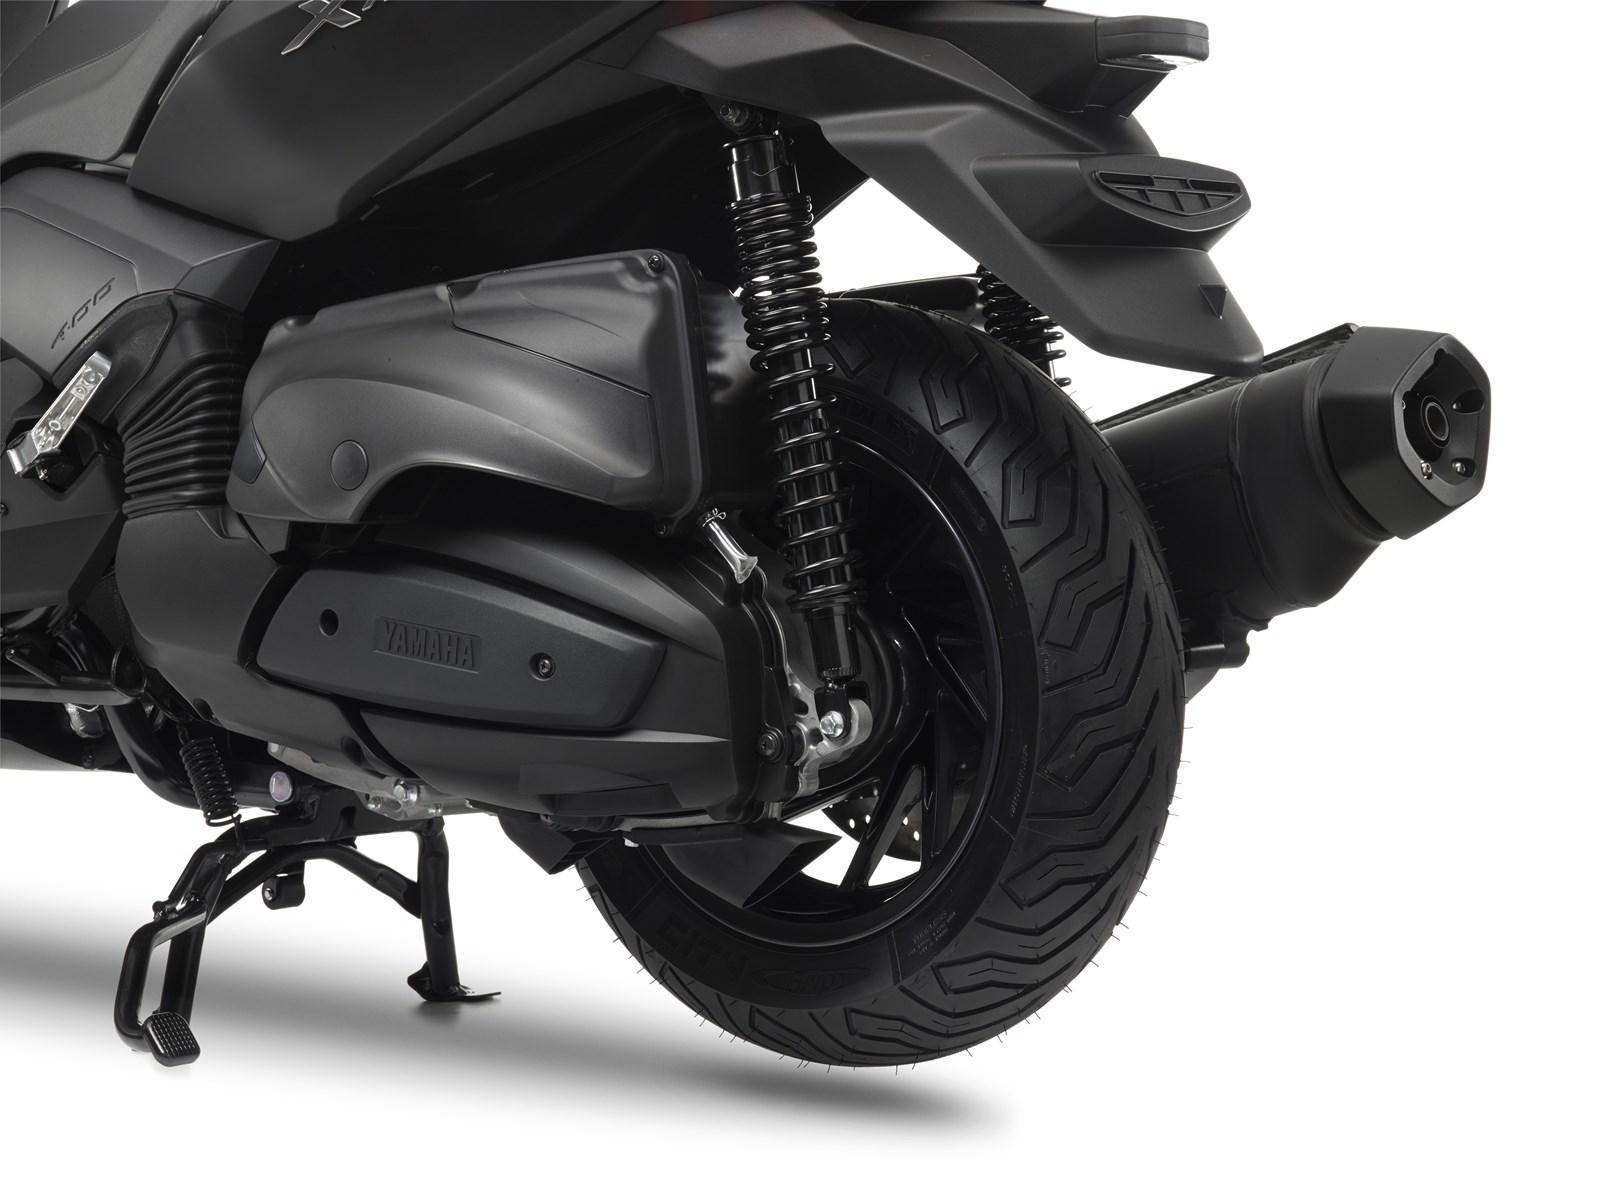 Foto de Yamaha X-MAX 400 MOMODESIGN, estudio y detalles (13/33)